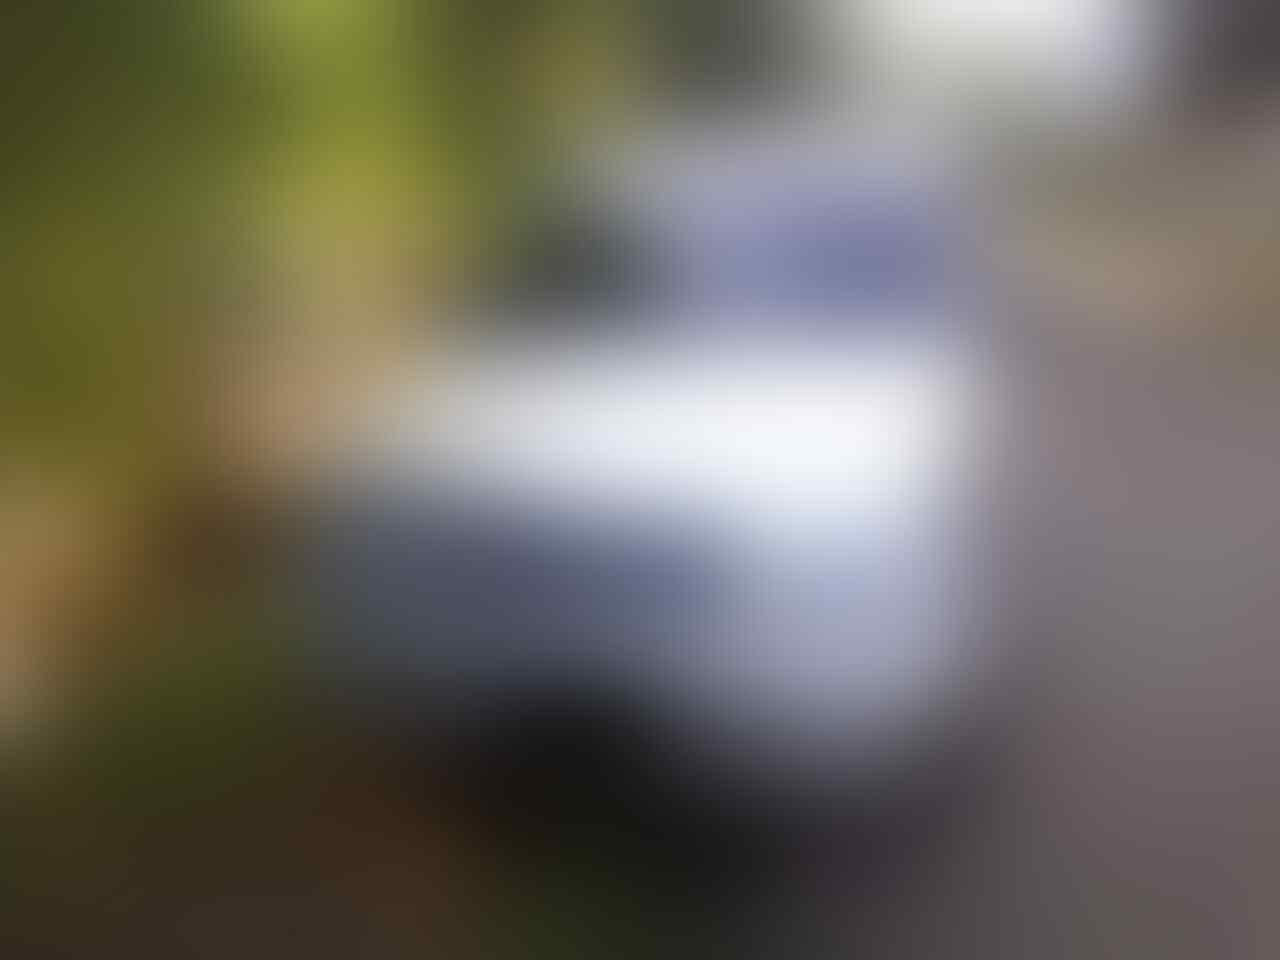 Toyota Kijang Ssx - Up 1,8 Th 2000 Efi (full Option)